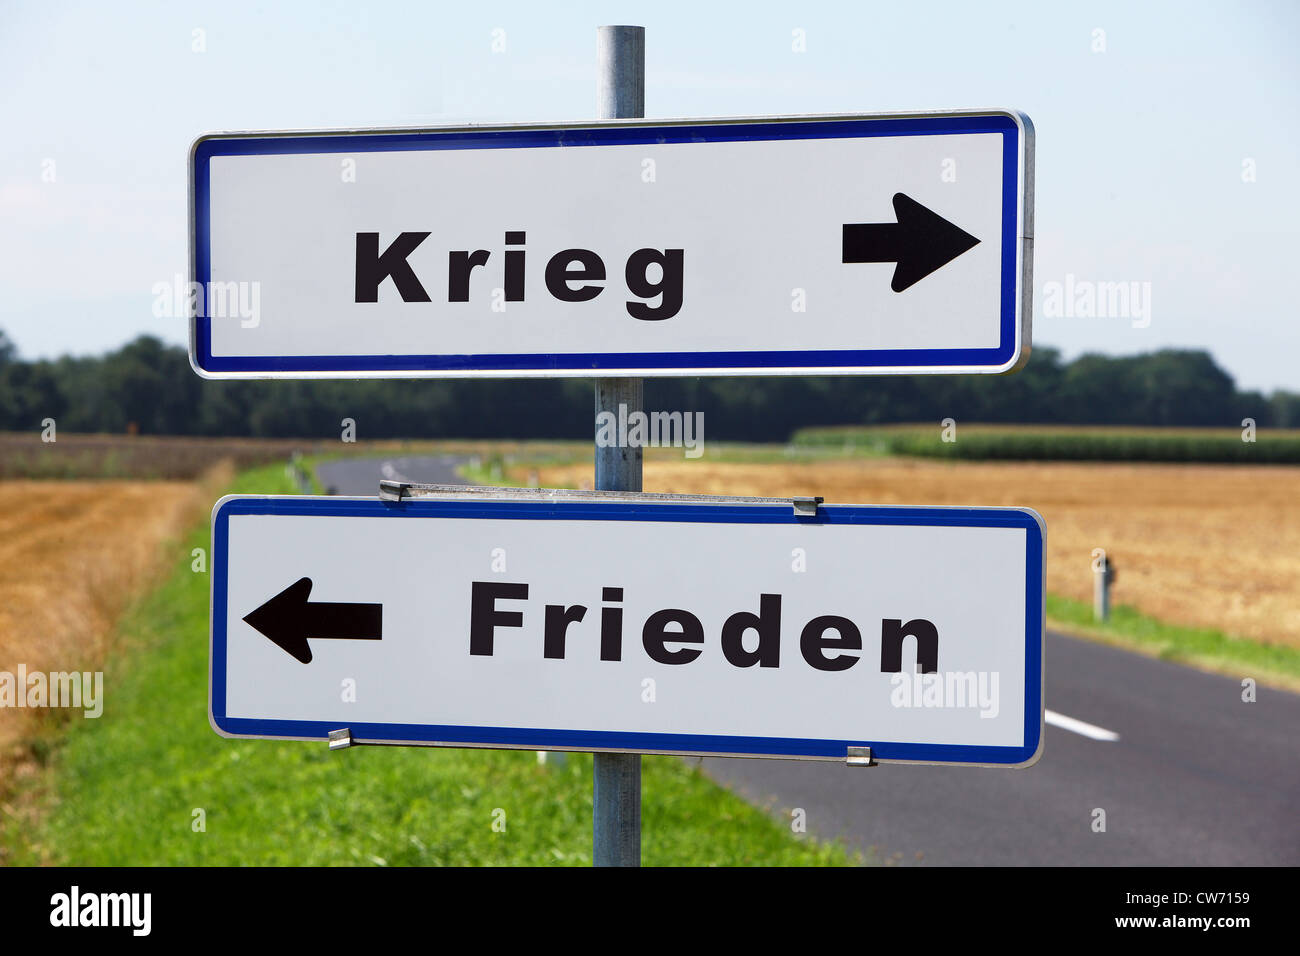 road signs Krieg - Frieden, war - peace - Stock Image